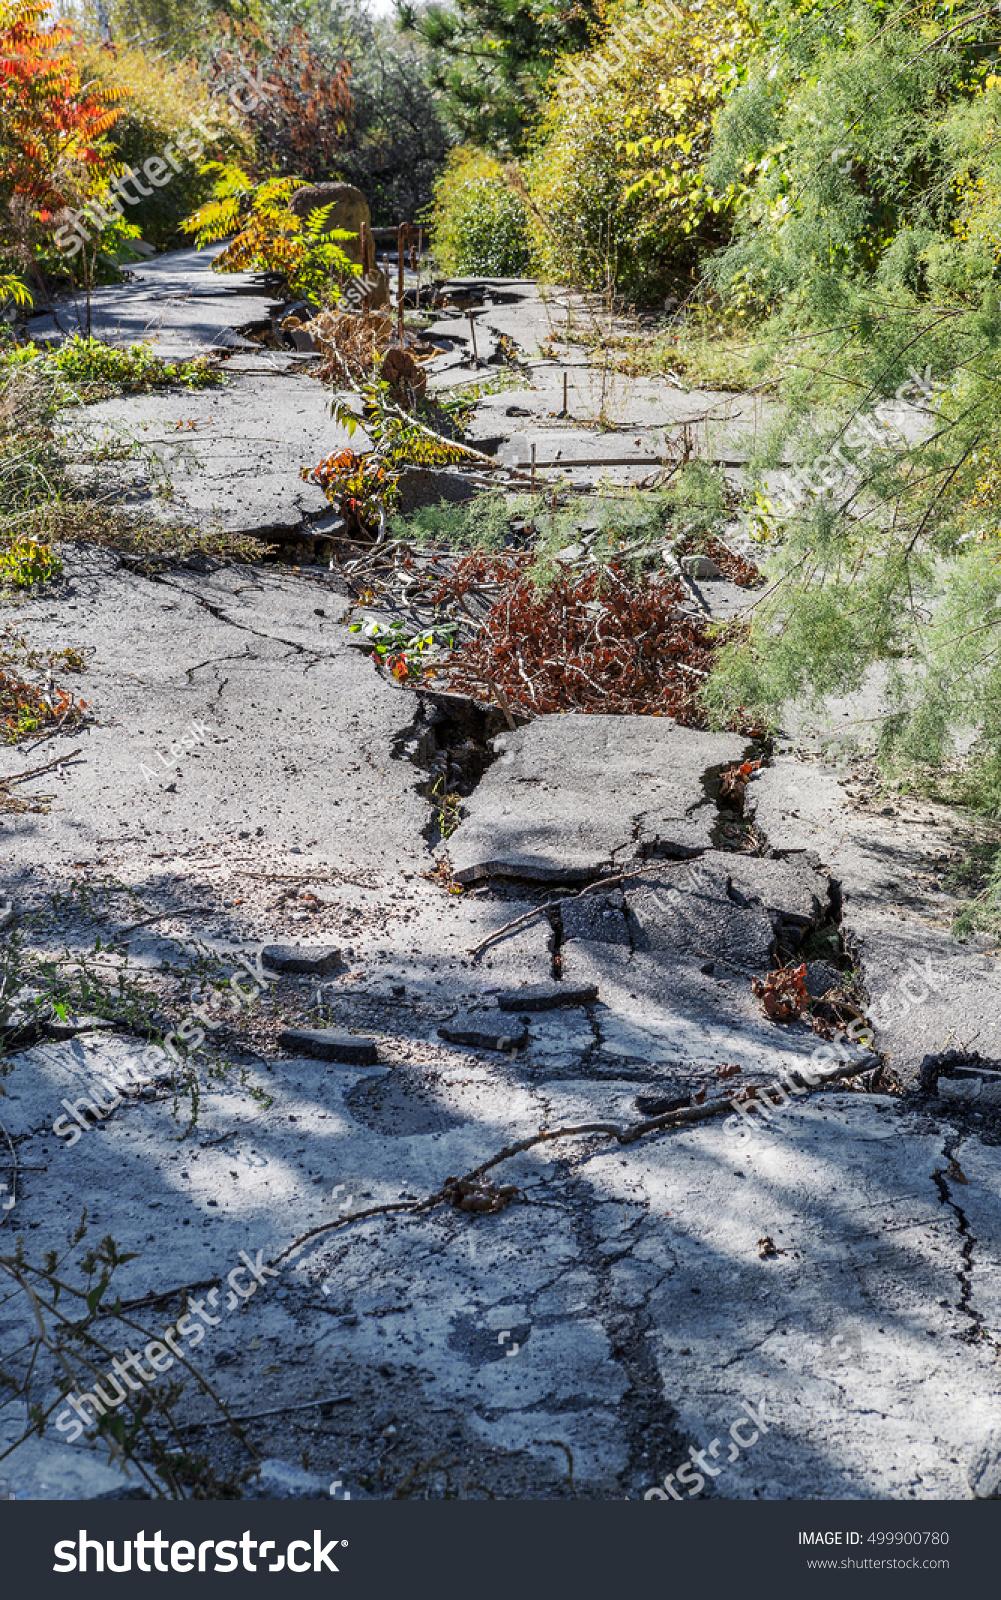 Landslide Caused By Torrential Rains Hurricane Stock Photo ...